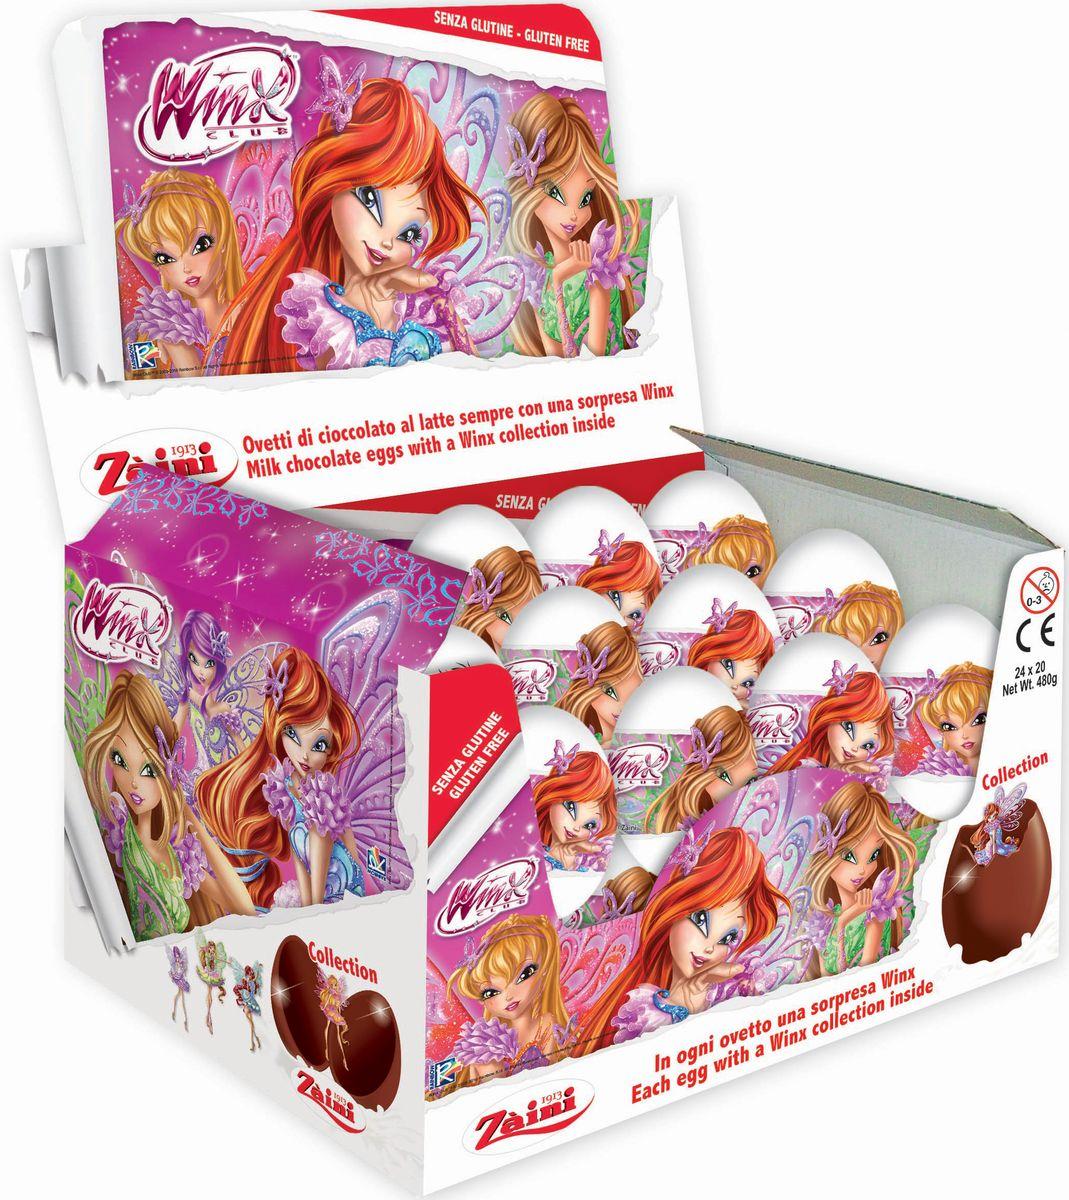 Zaini Winx шоколадные яйца с игрушкой, 24 шт по 20 г zaini choco